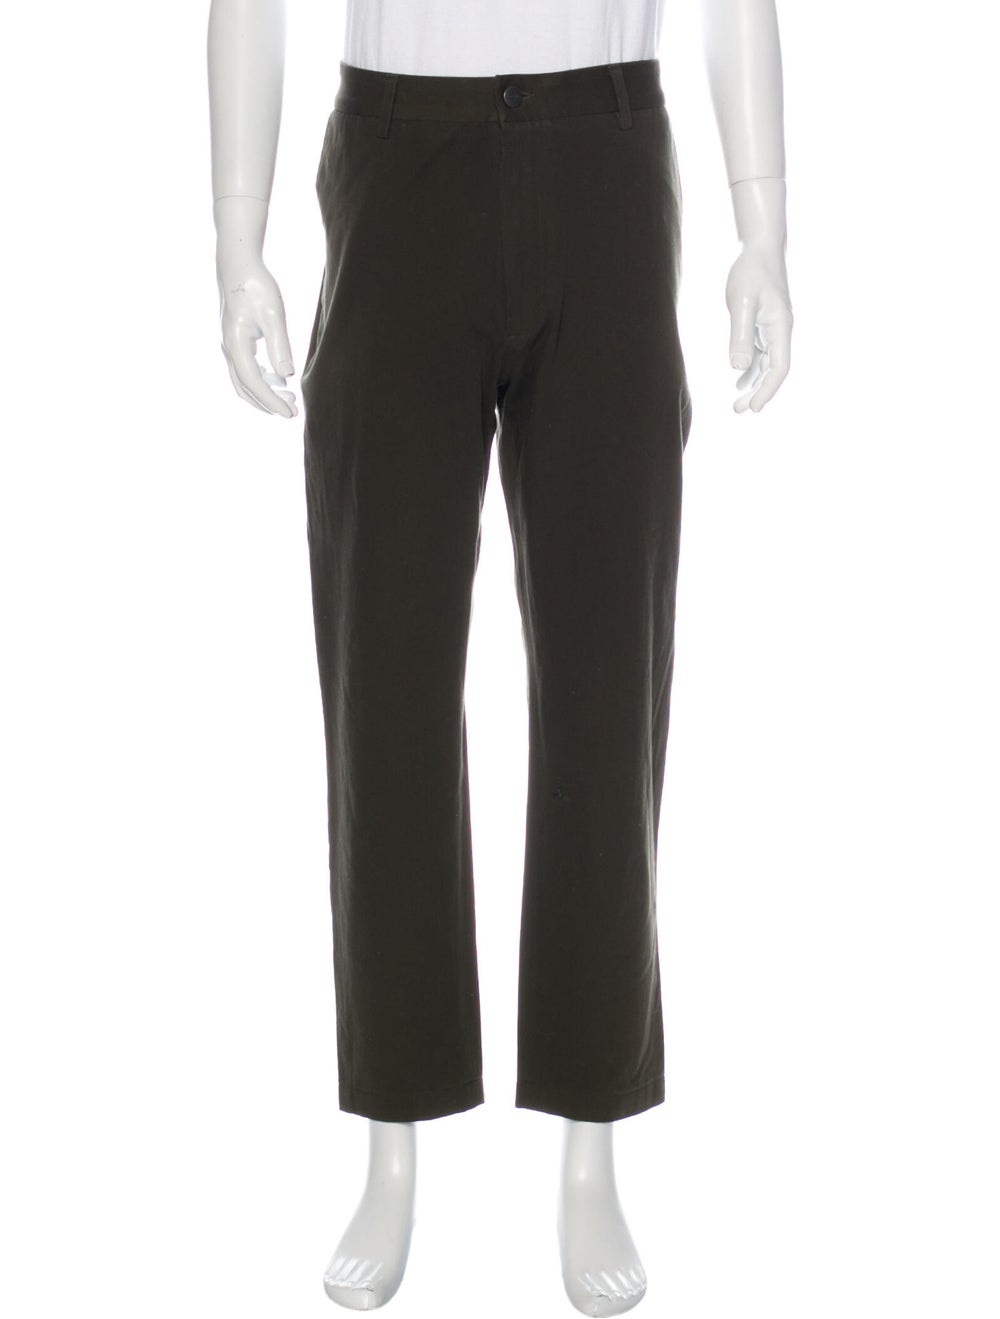 Arcady Pants Green - image 1